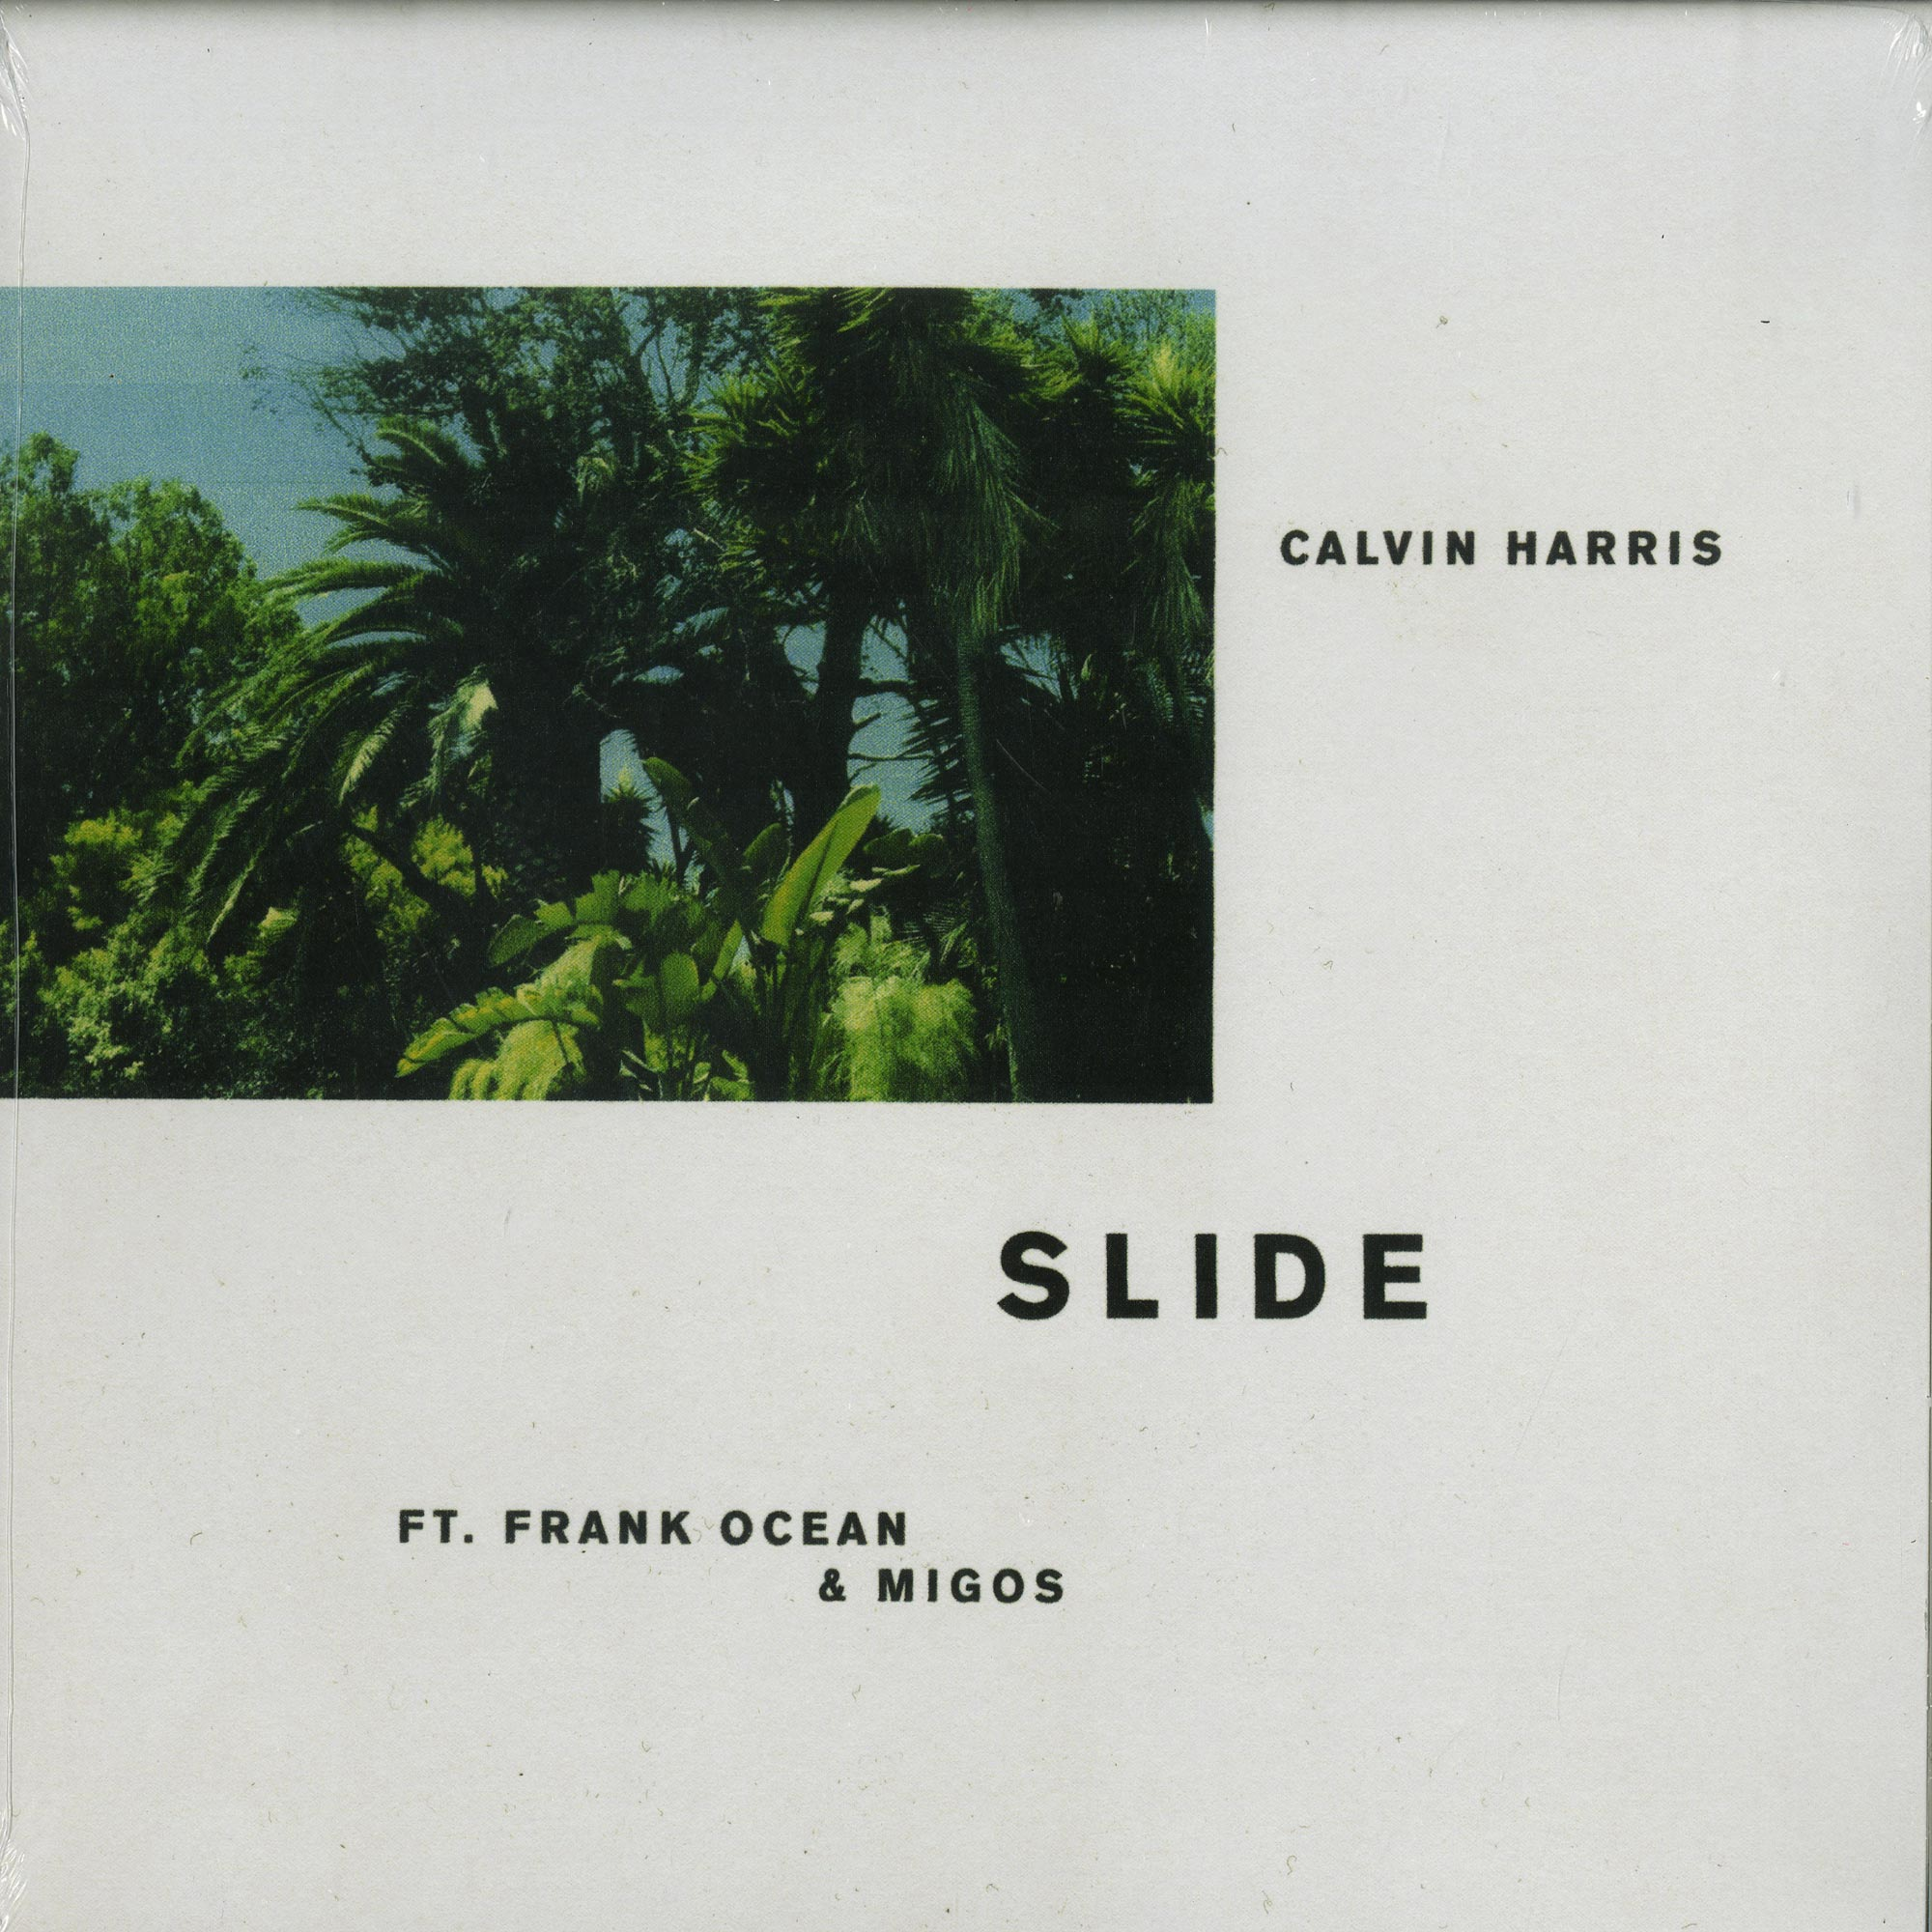 Calvin Harris ft. Frank Ocean & Migos - SLIDE